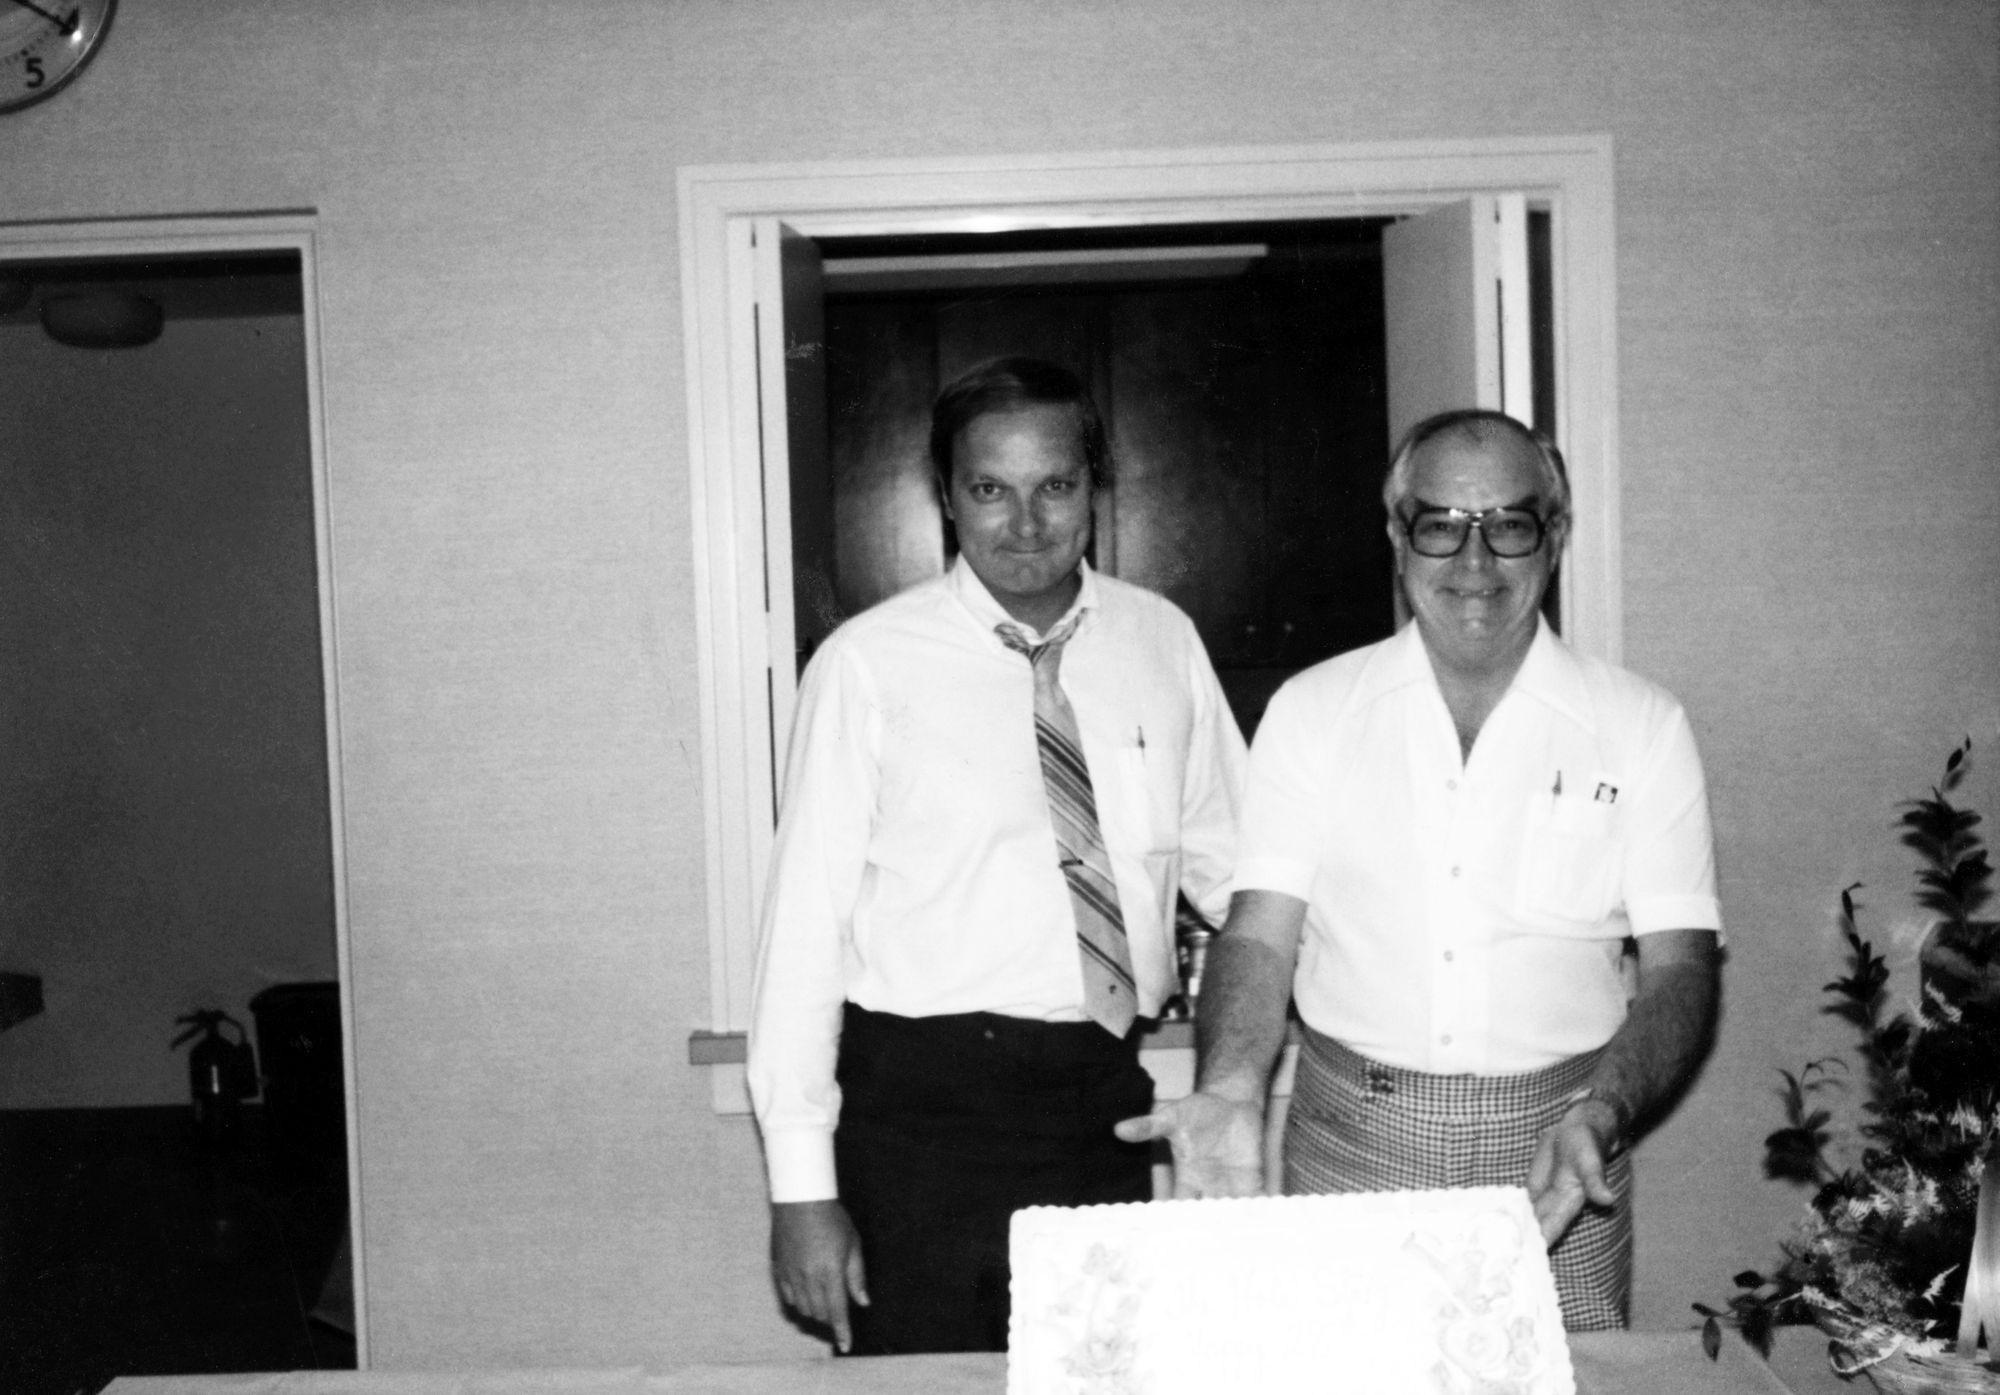 Bob McNichols and his son Gene McNichols